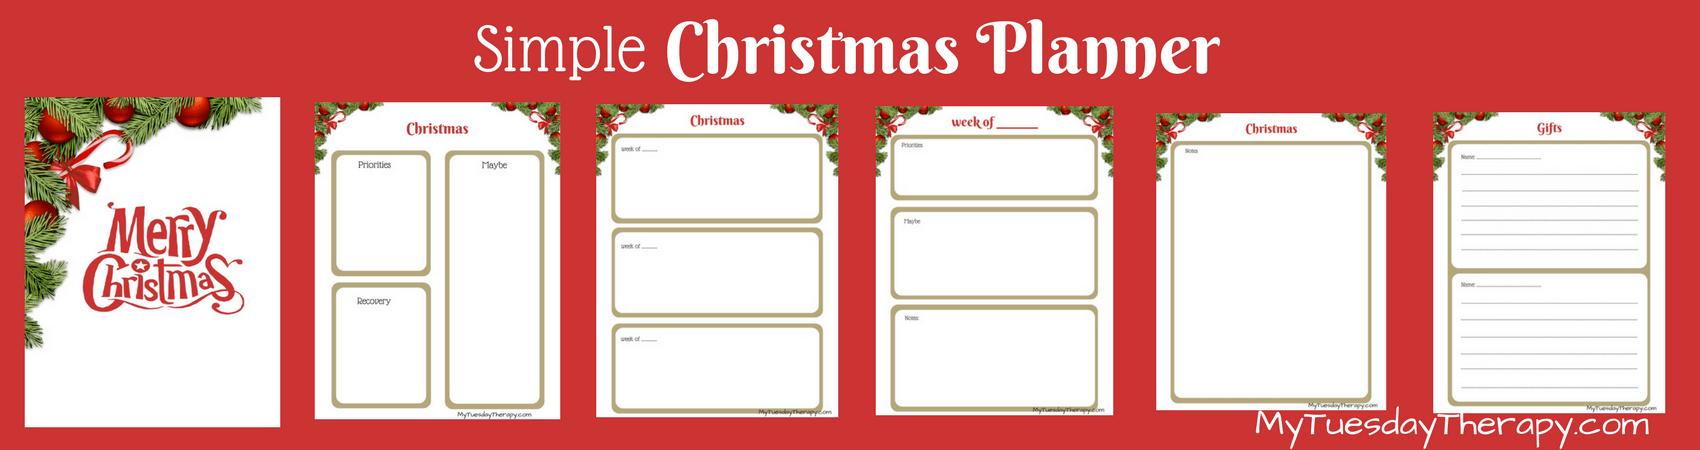 Simple Christmas Planner